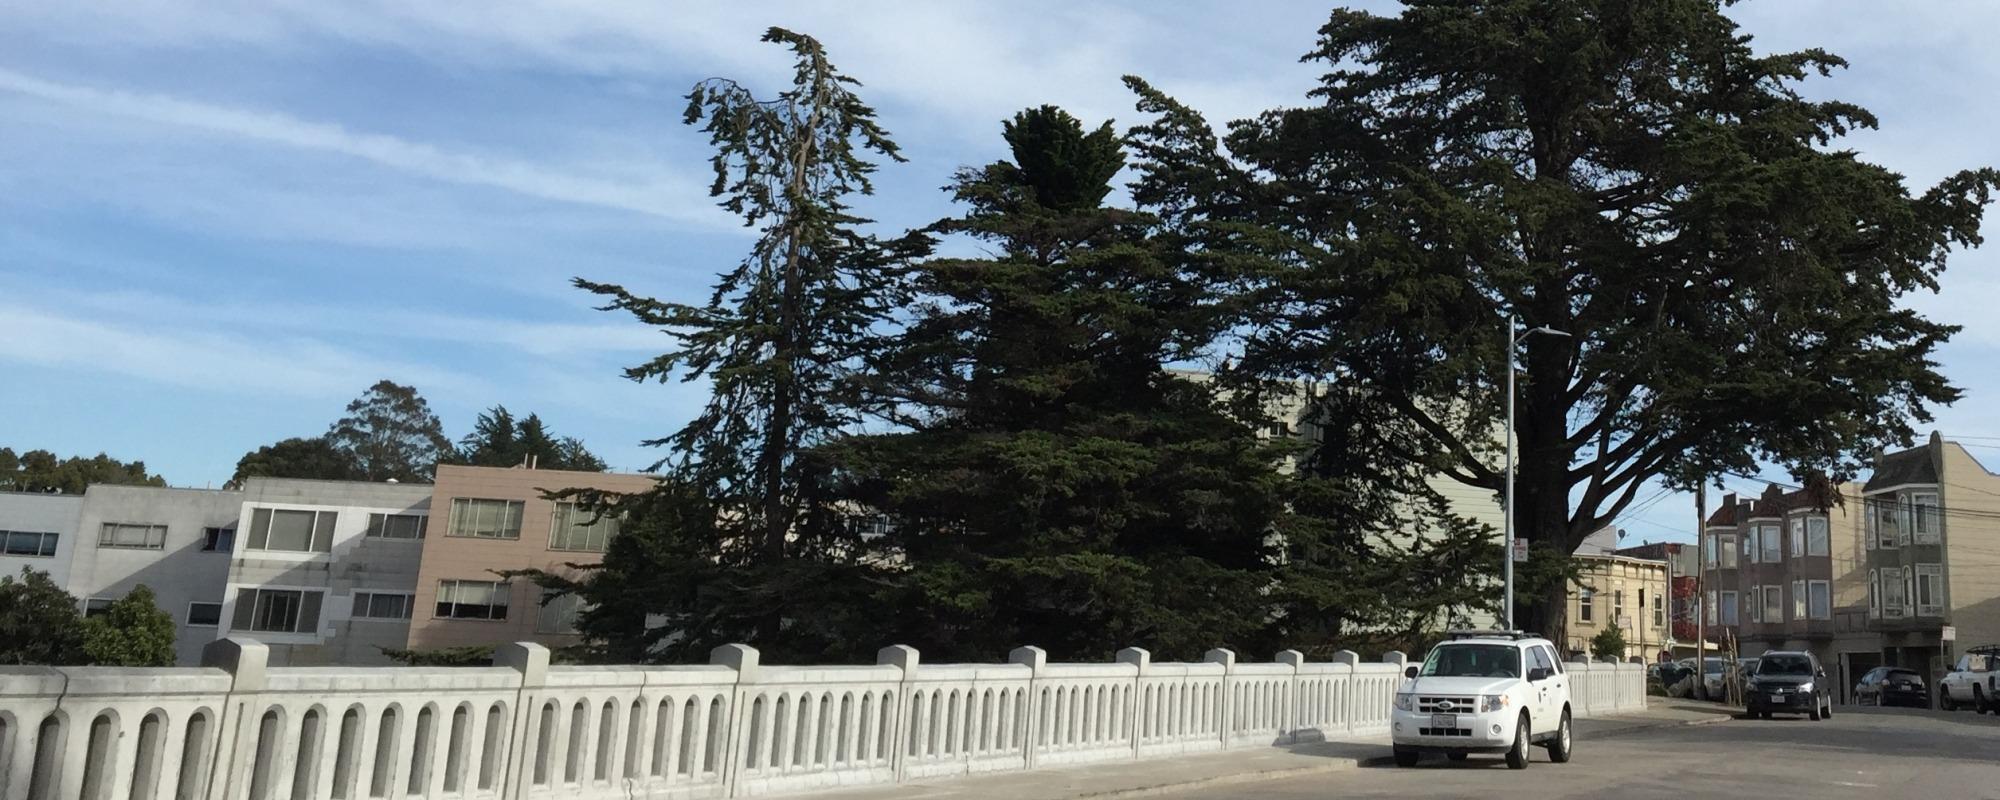 bridge reopened Dec 8